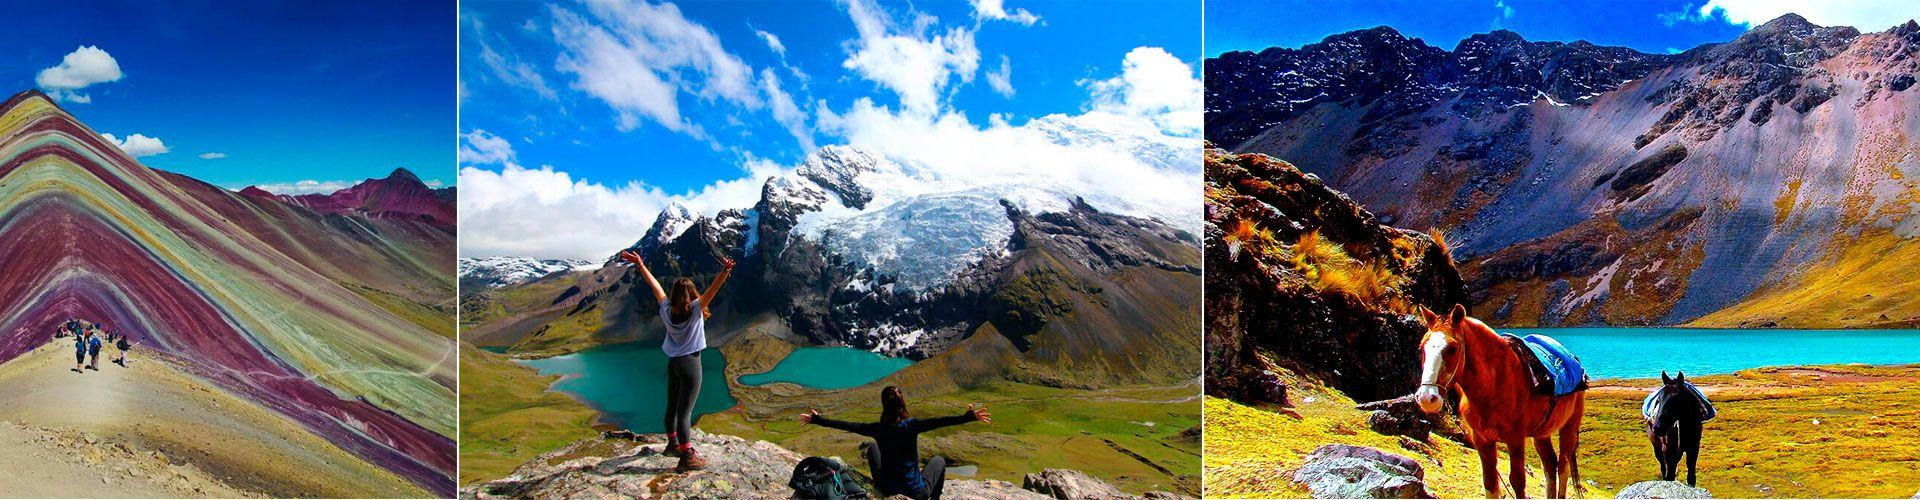 Ausangate + Rainbow Mountain 6D/5N Challenge